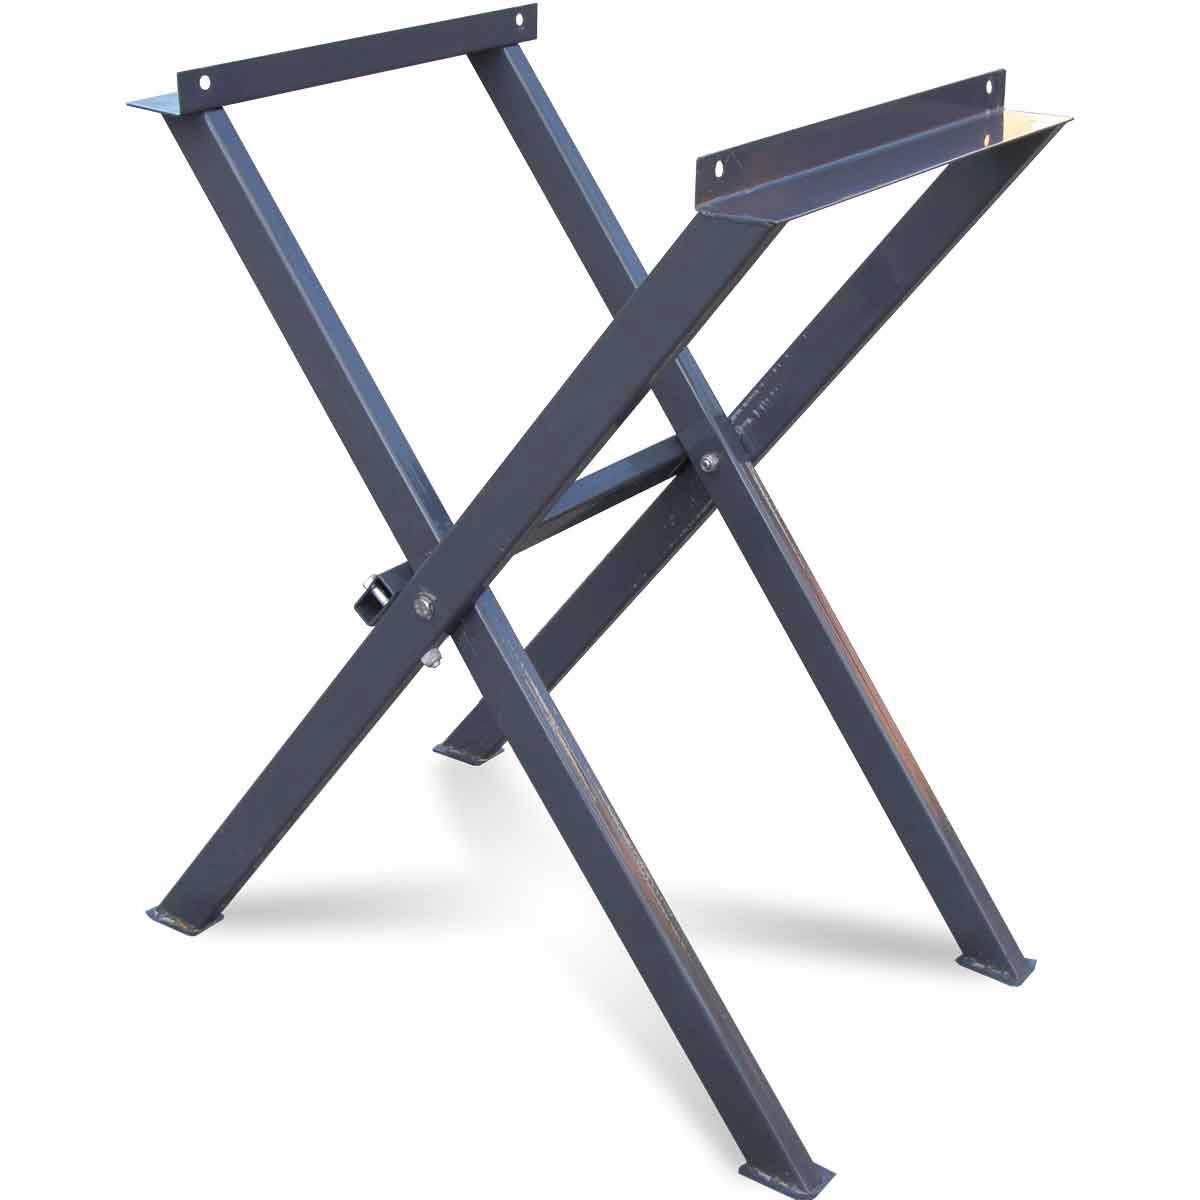 Folding Stand Rubi rail saws